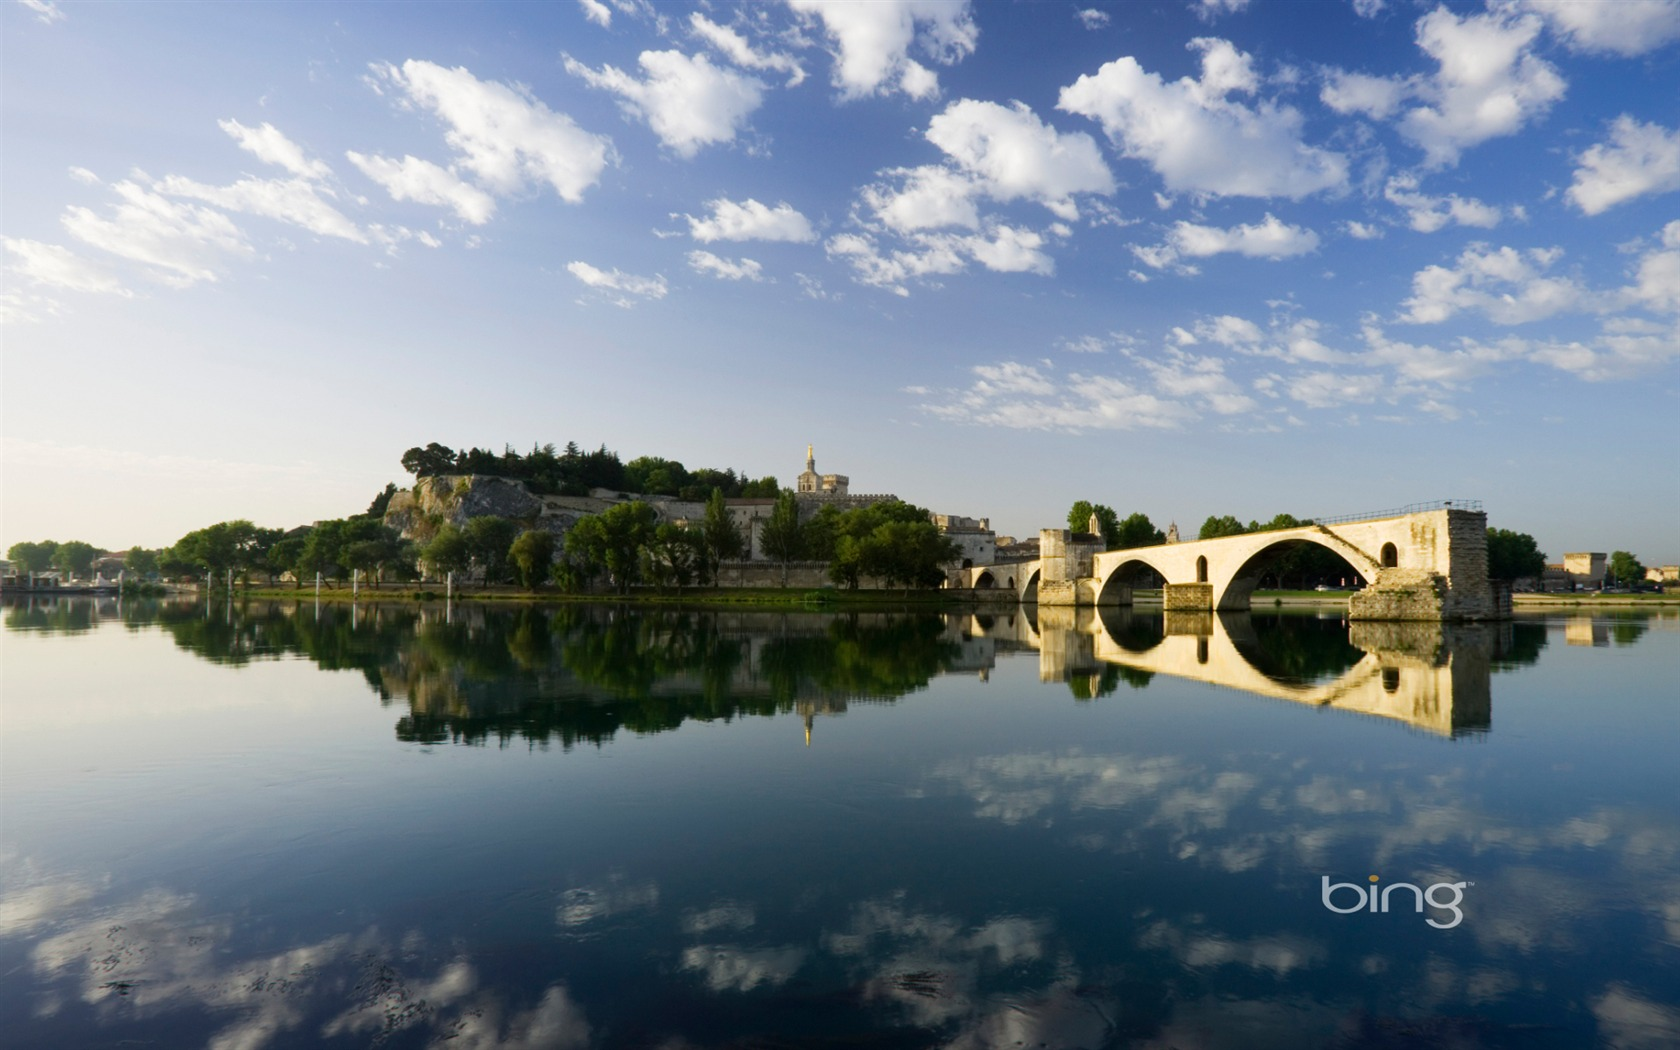 France Bing Wallpaper   1680x1050 wallpaper download  10wallpapercom 1680x1050